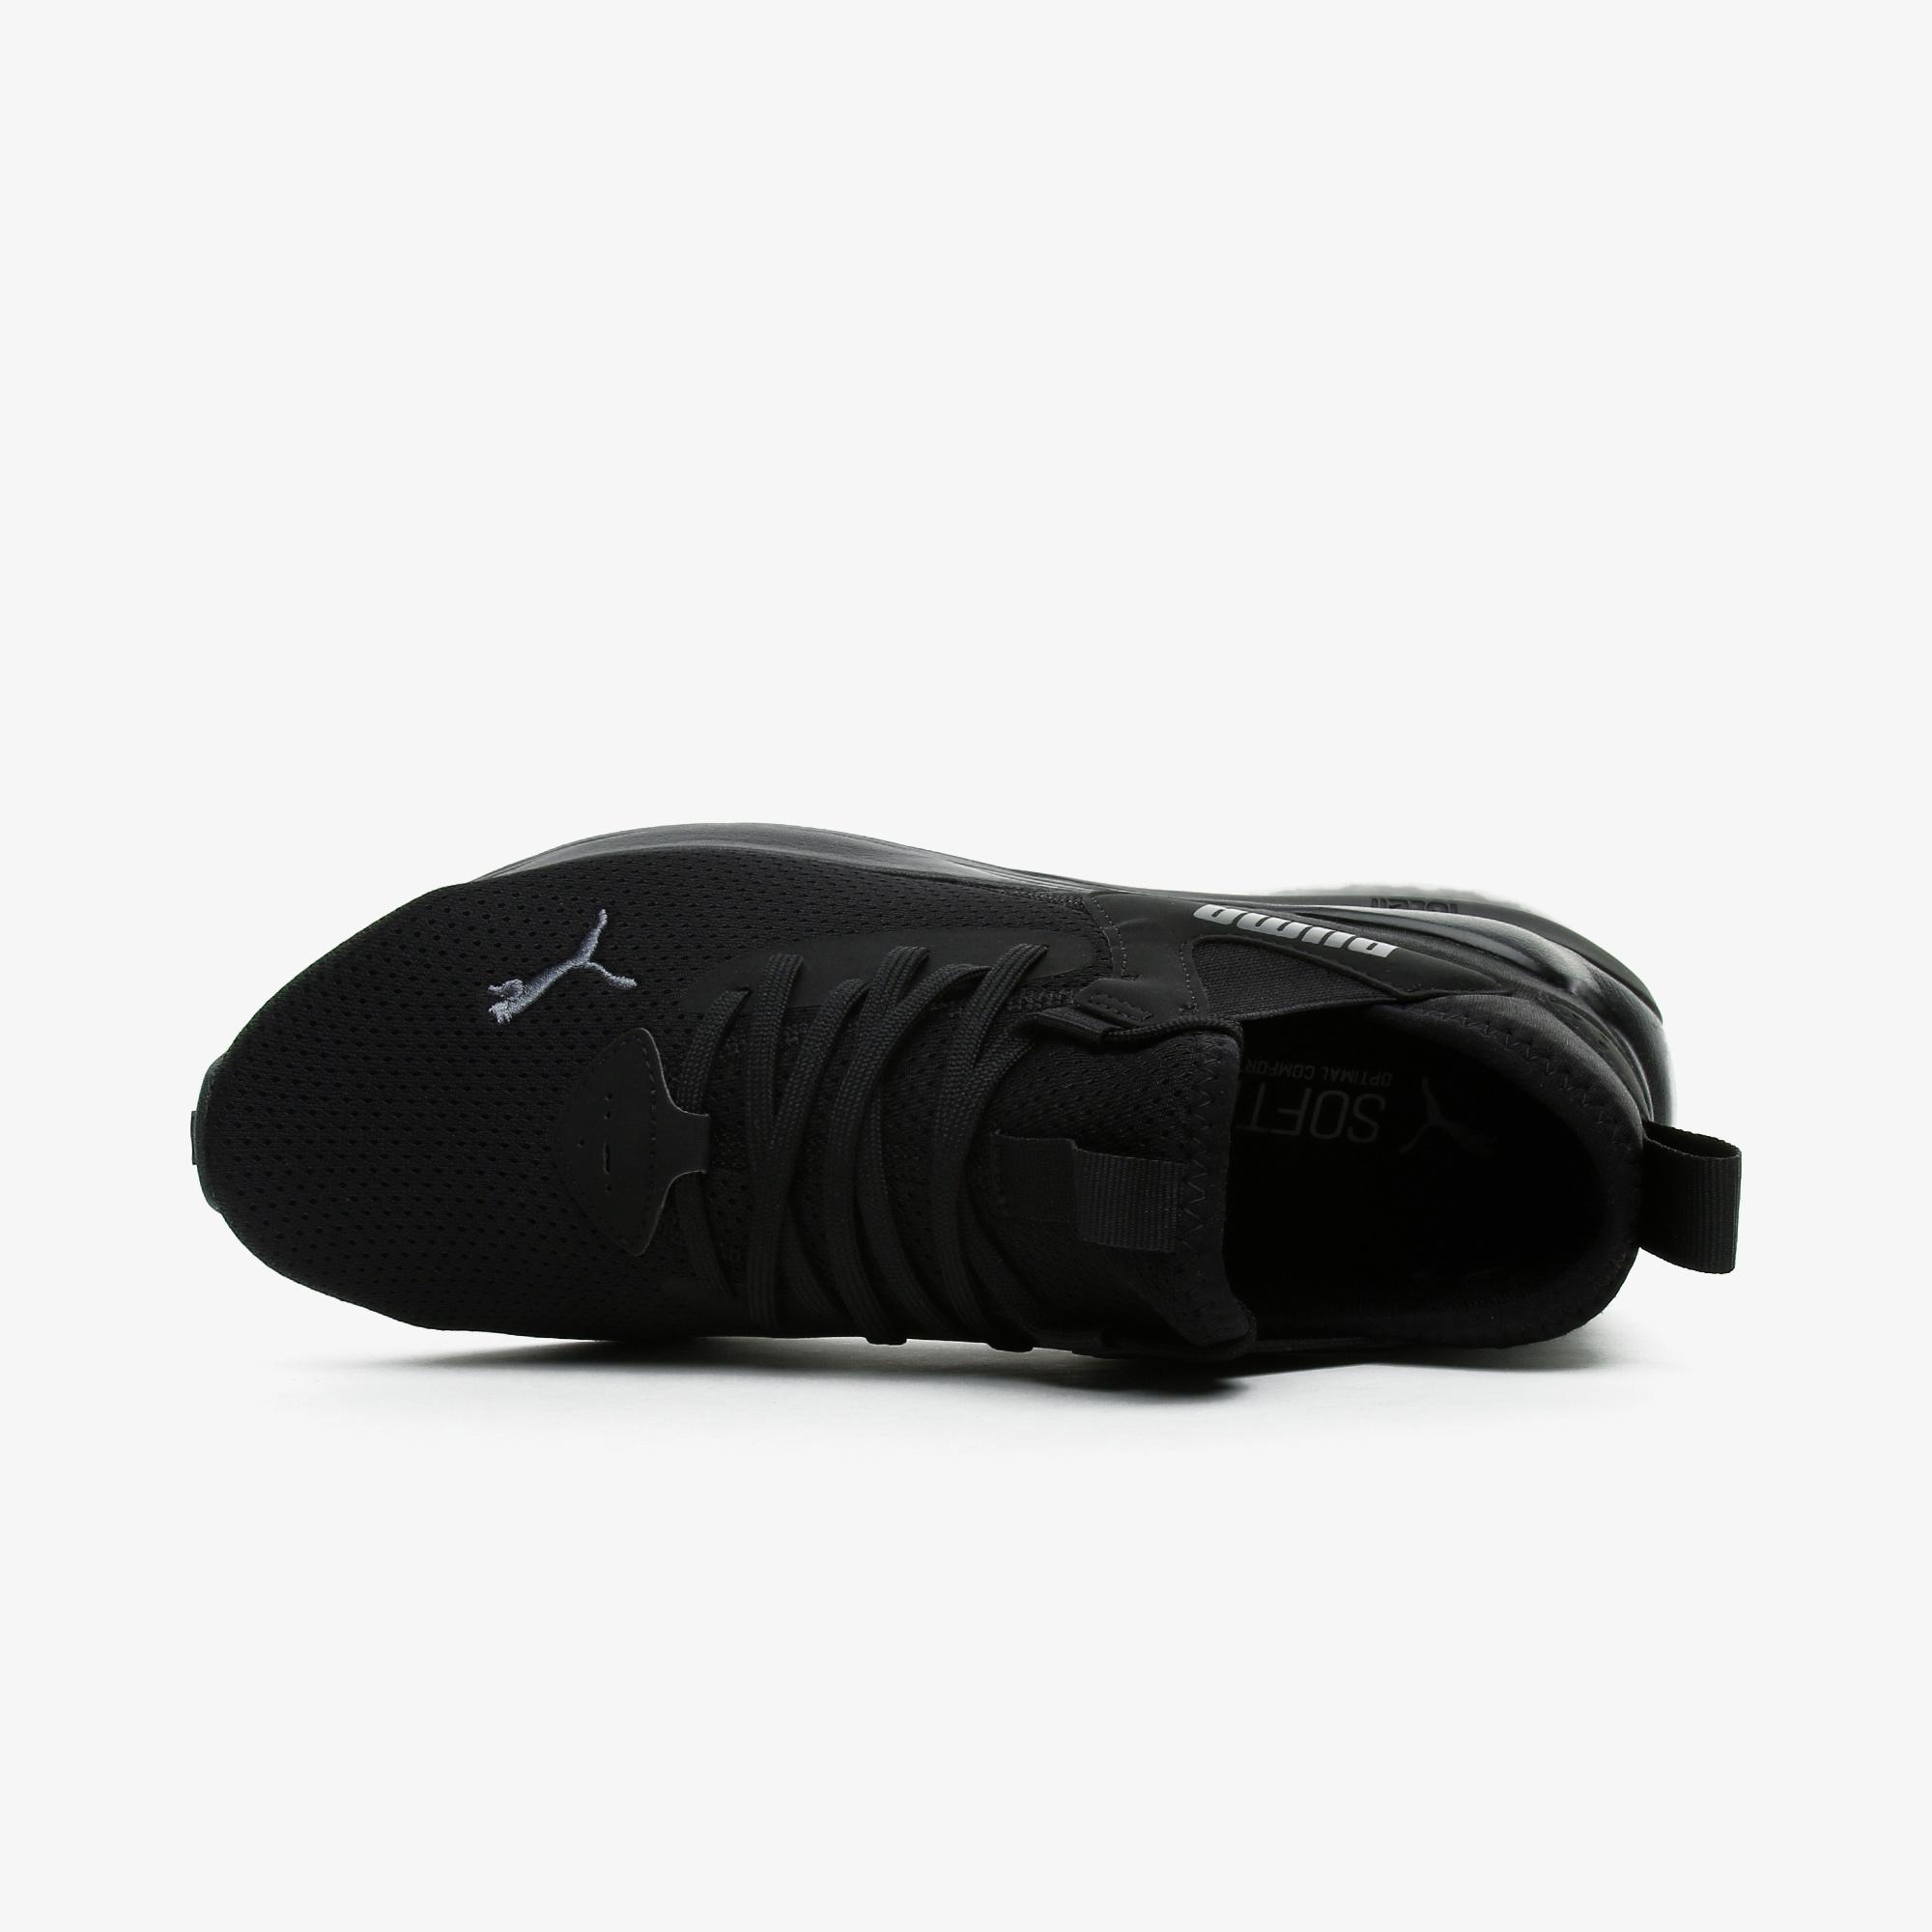 Puma Cell Vive Erkek Siyah Spor Ayakkabı